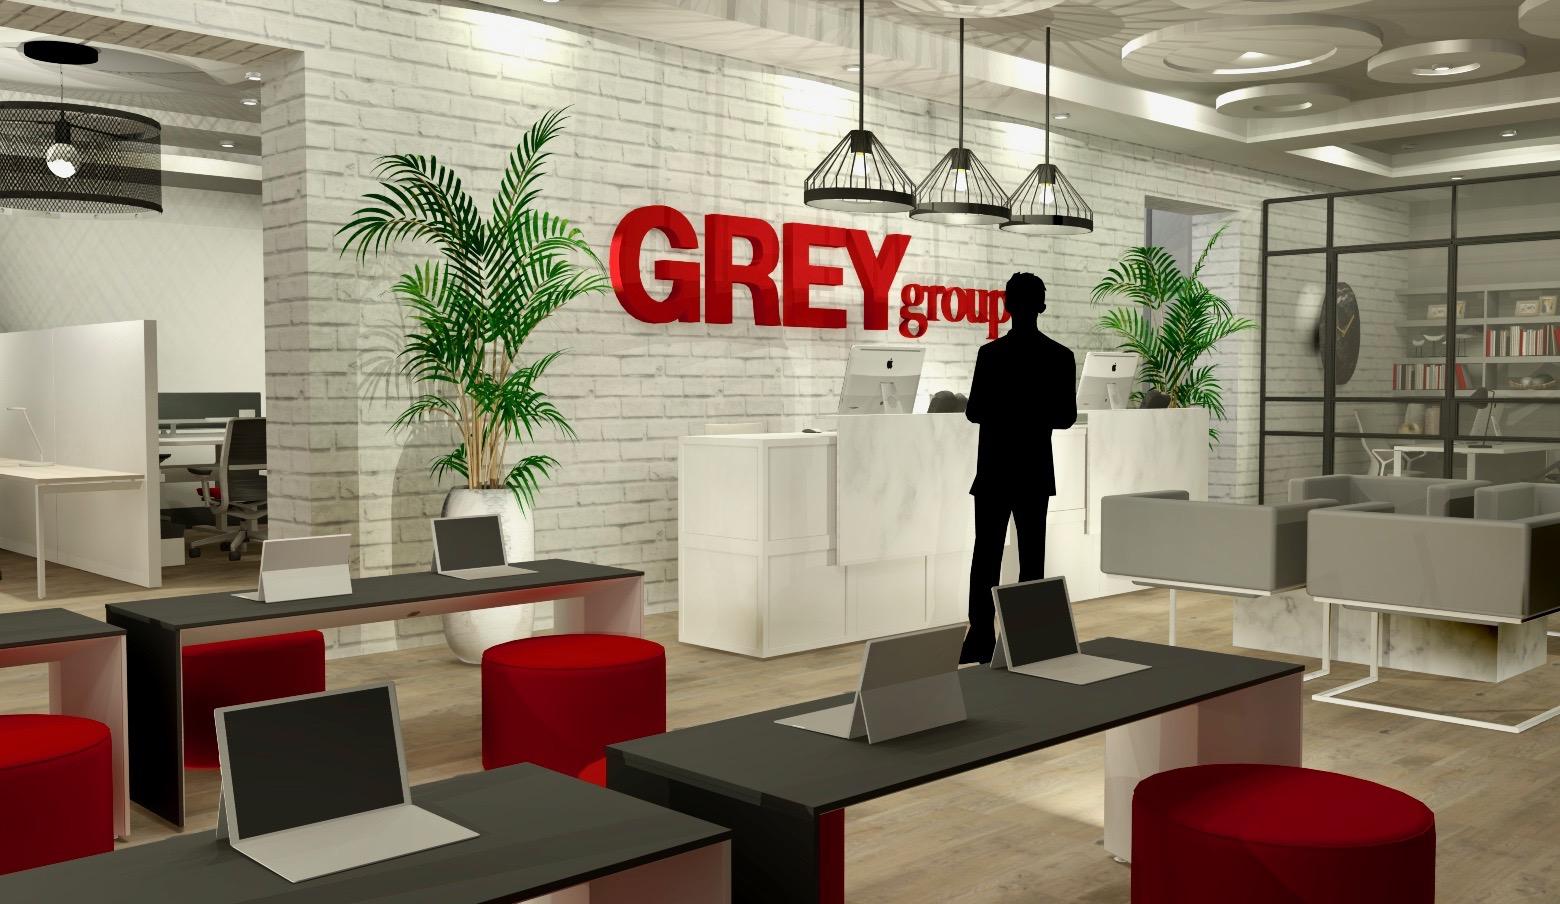 advertising agency office. Second Floor Office Space Advertising Agency 0